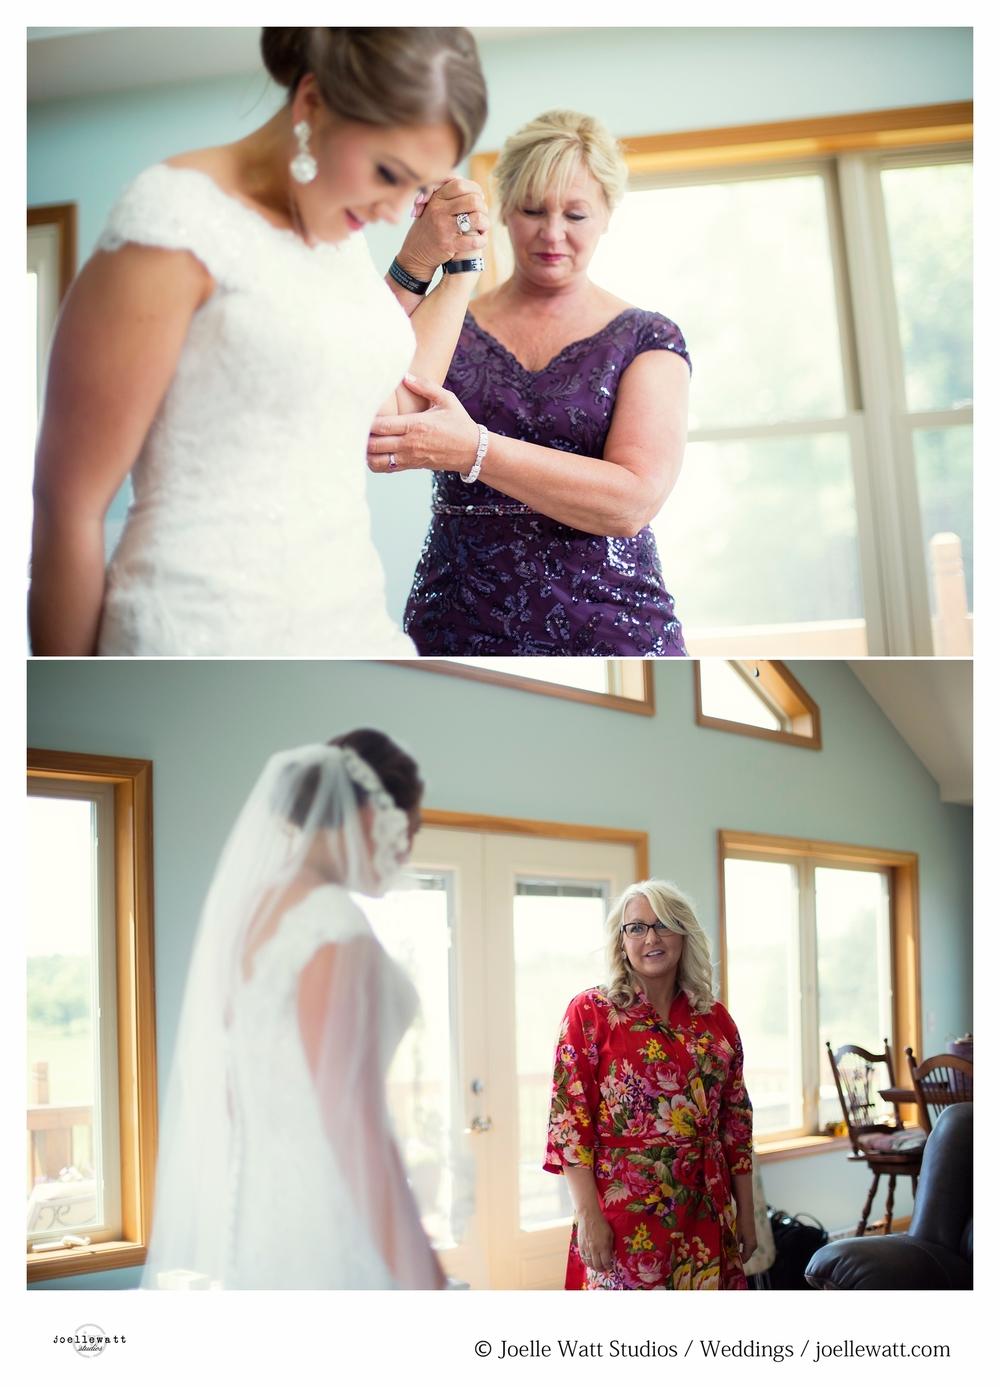 Terwiske Wedding 3.jpg